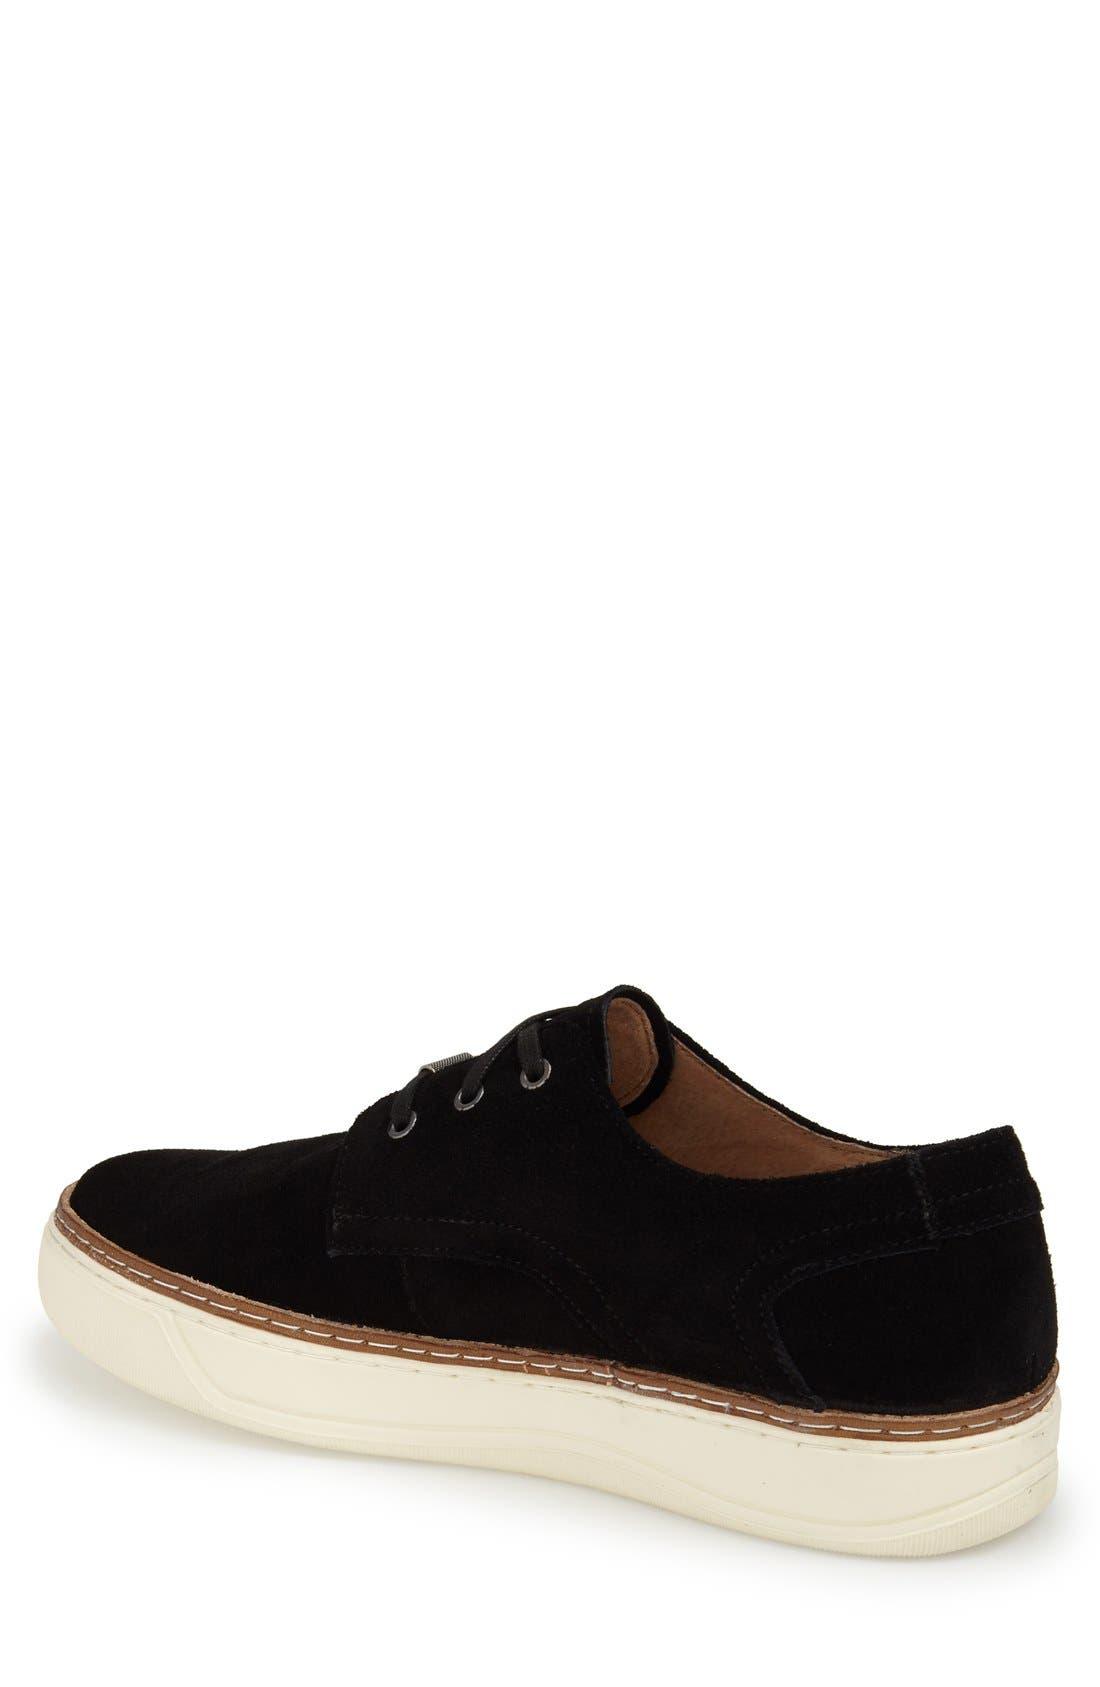 'Edson' Sneaker,                             Alternate thumbnail 2, color,                             008